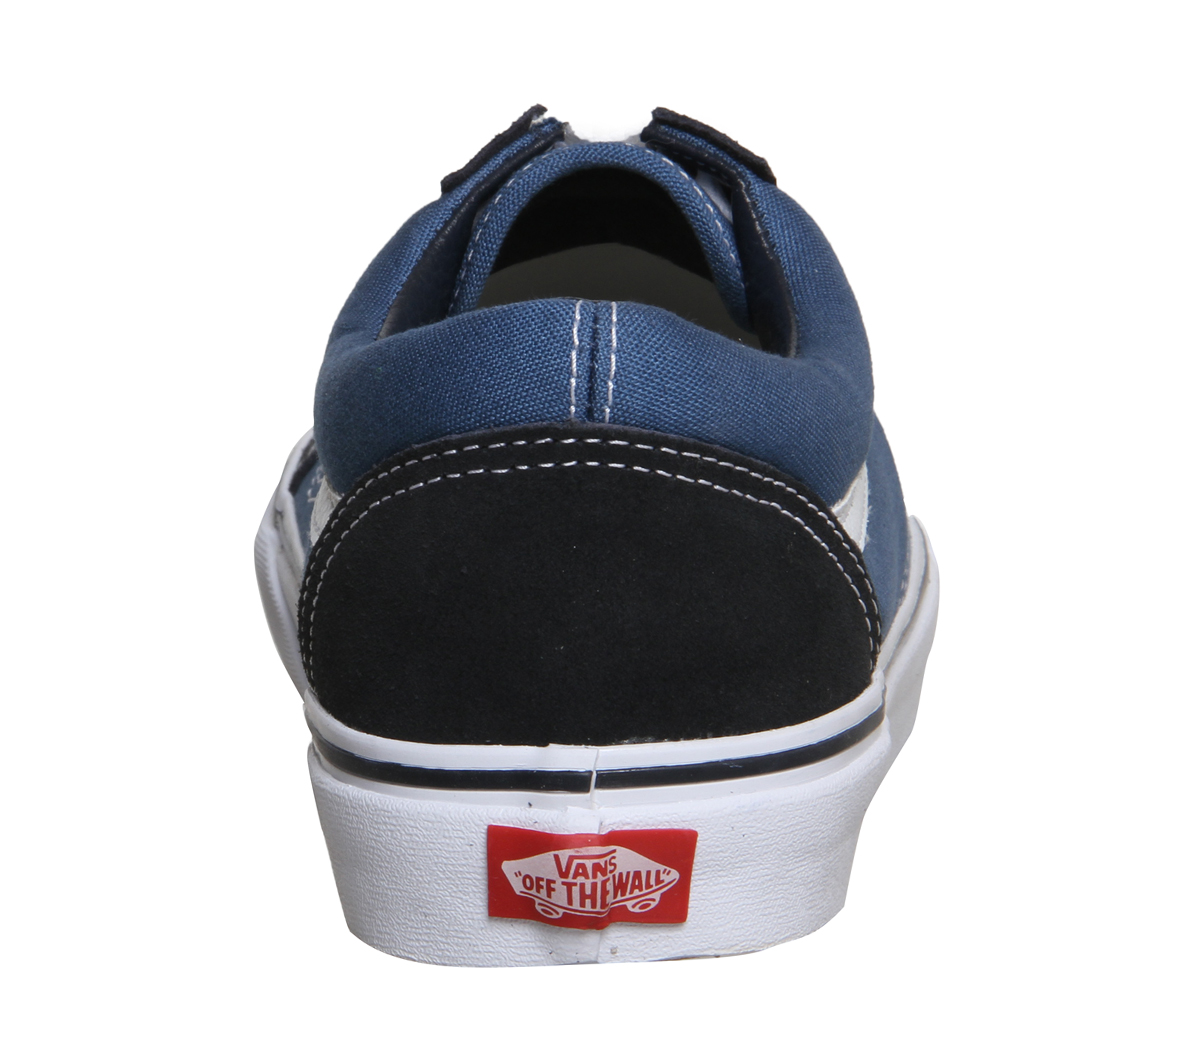 84a483c489 Homme-Vans-Old-Skool-Bleu-marine-Baskets-Chaussures miniature